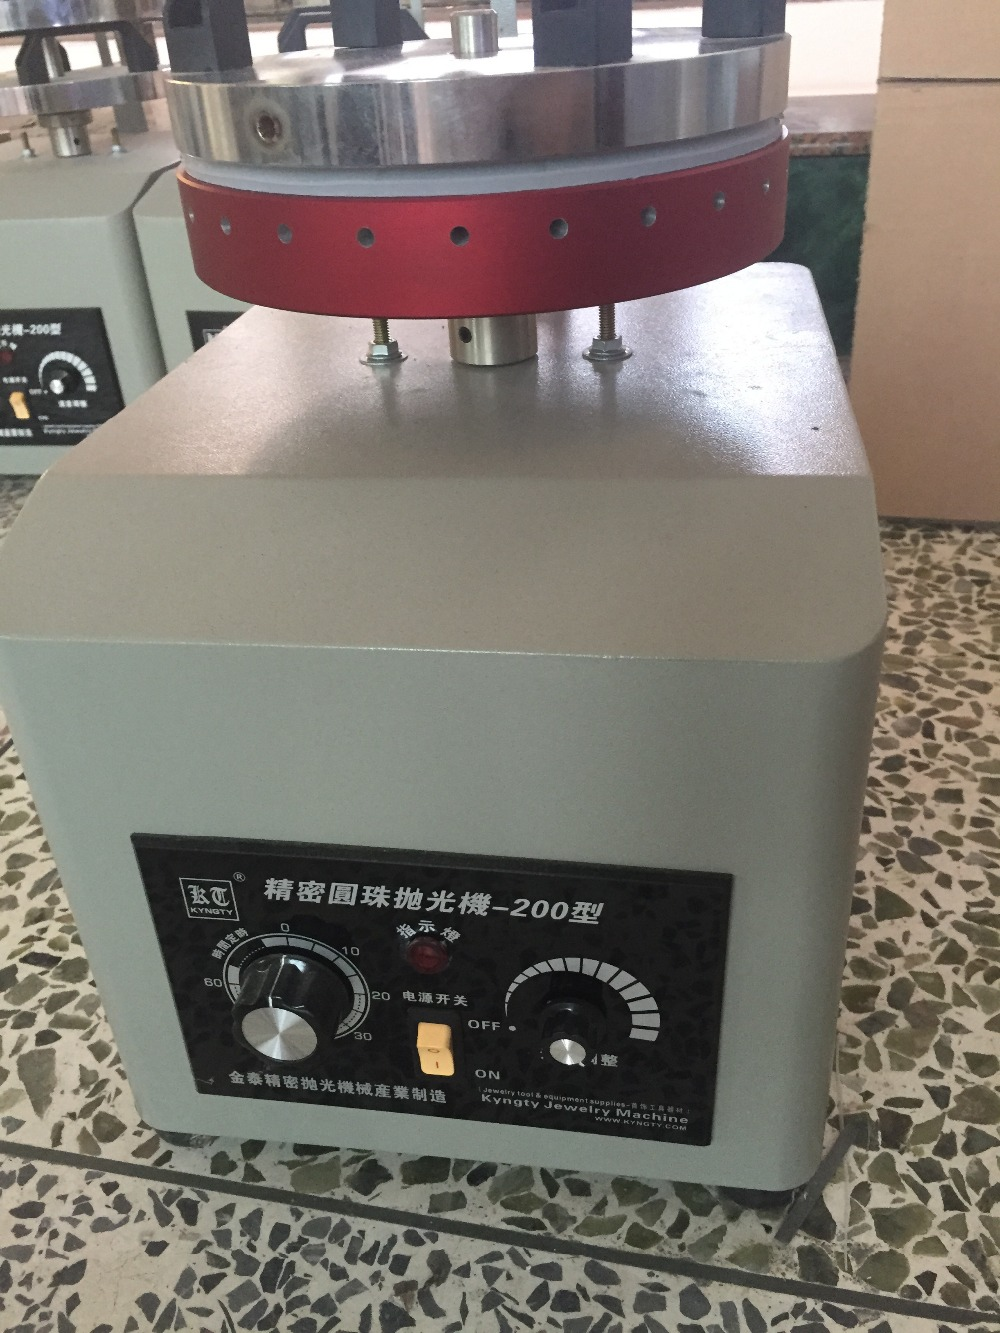 round beads polisher jewelry polishing machine,Rotary Rock Tumbler,wood beads grinding engraving cleaning burnishing drum